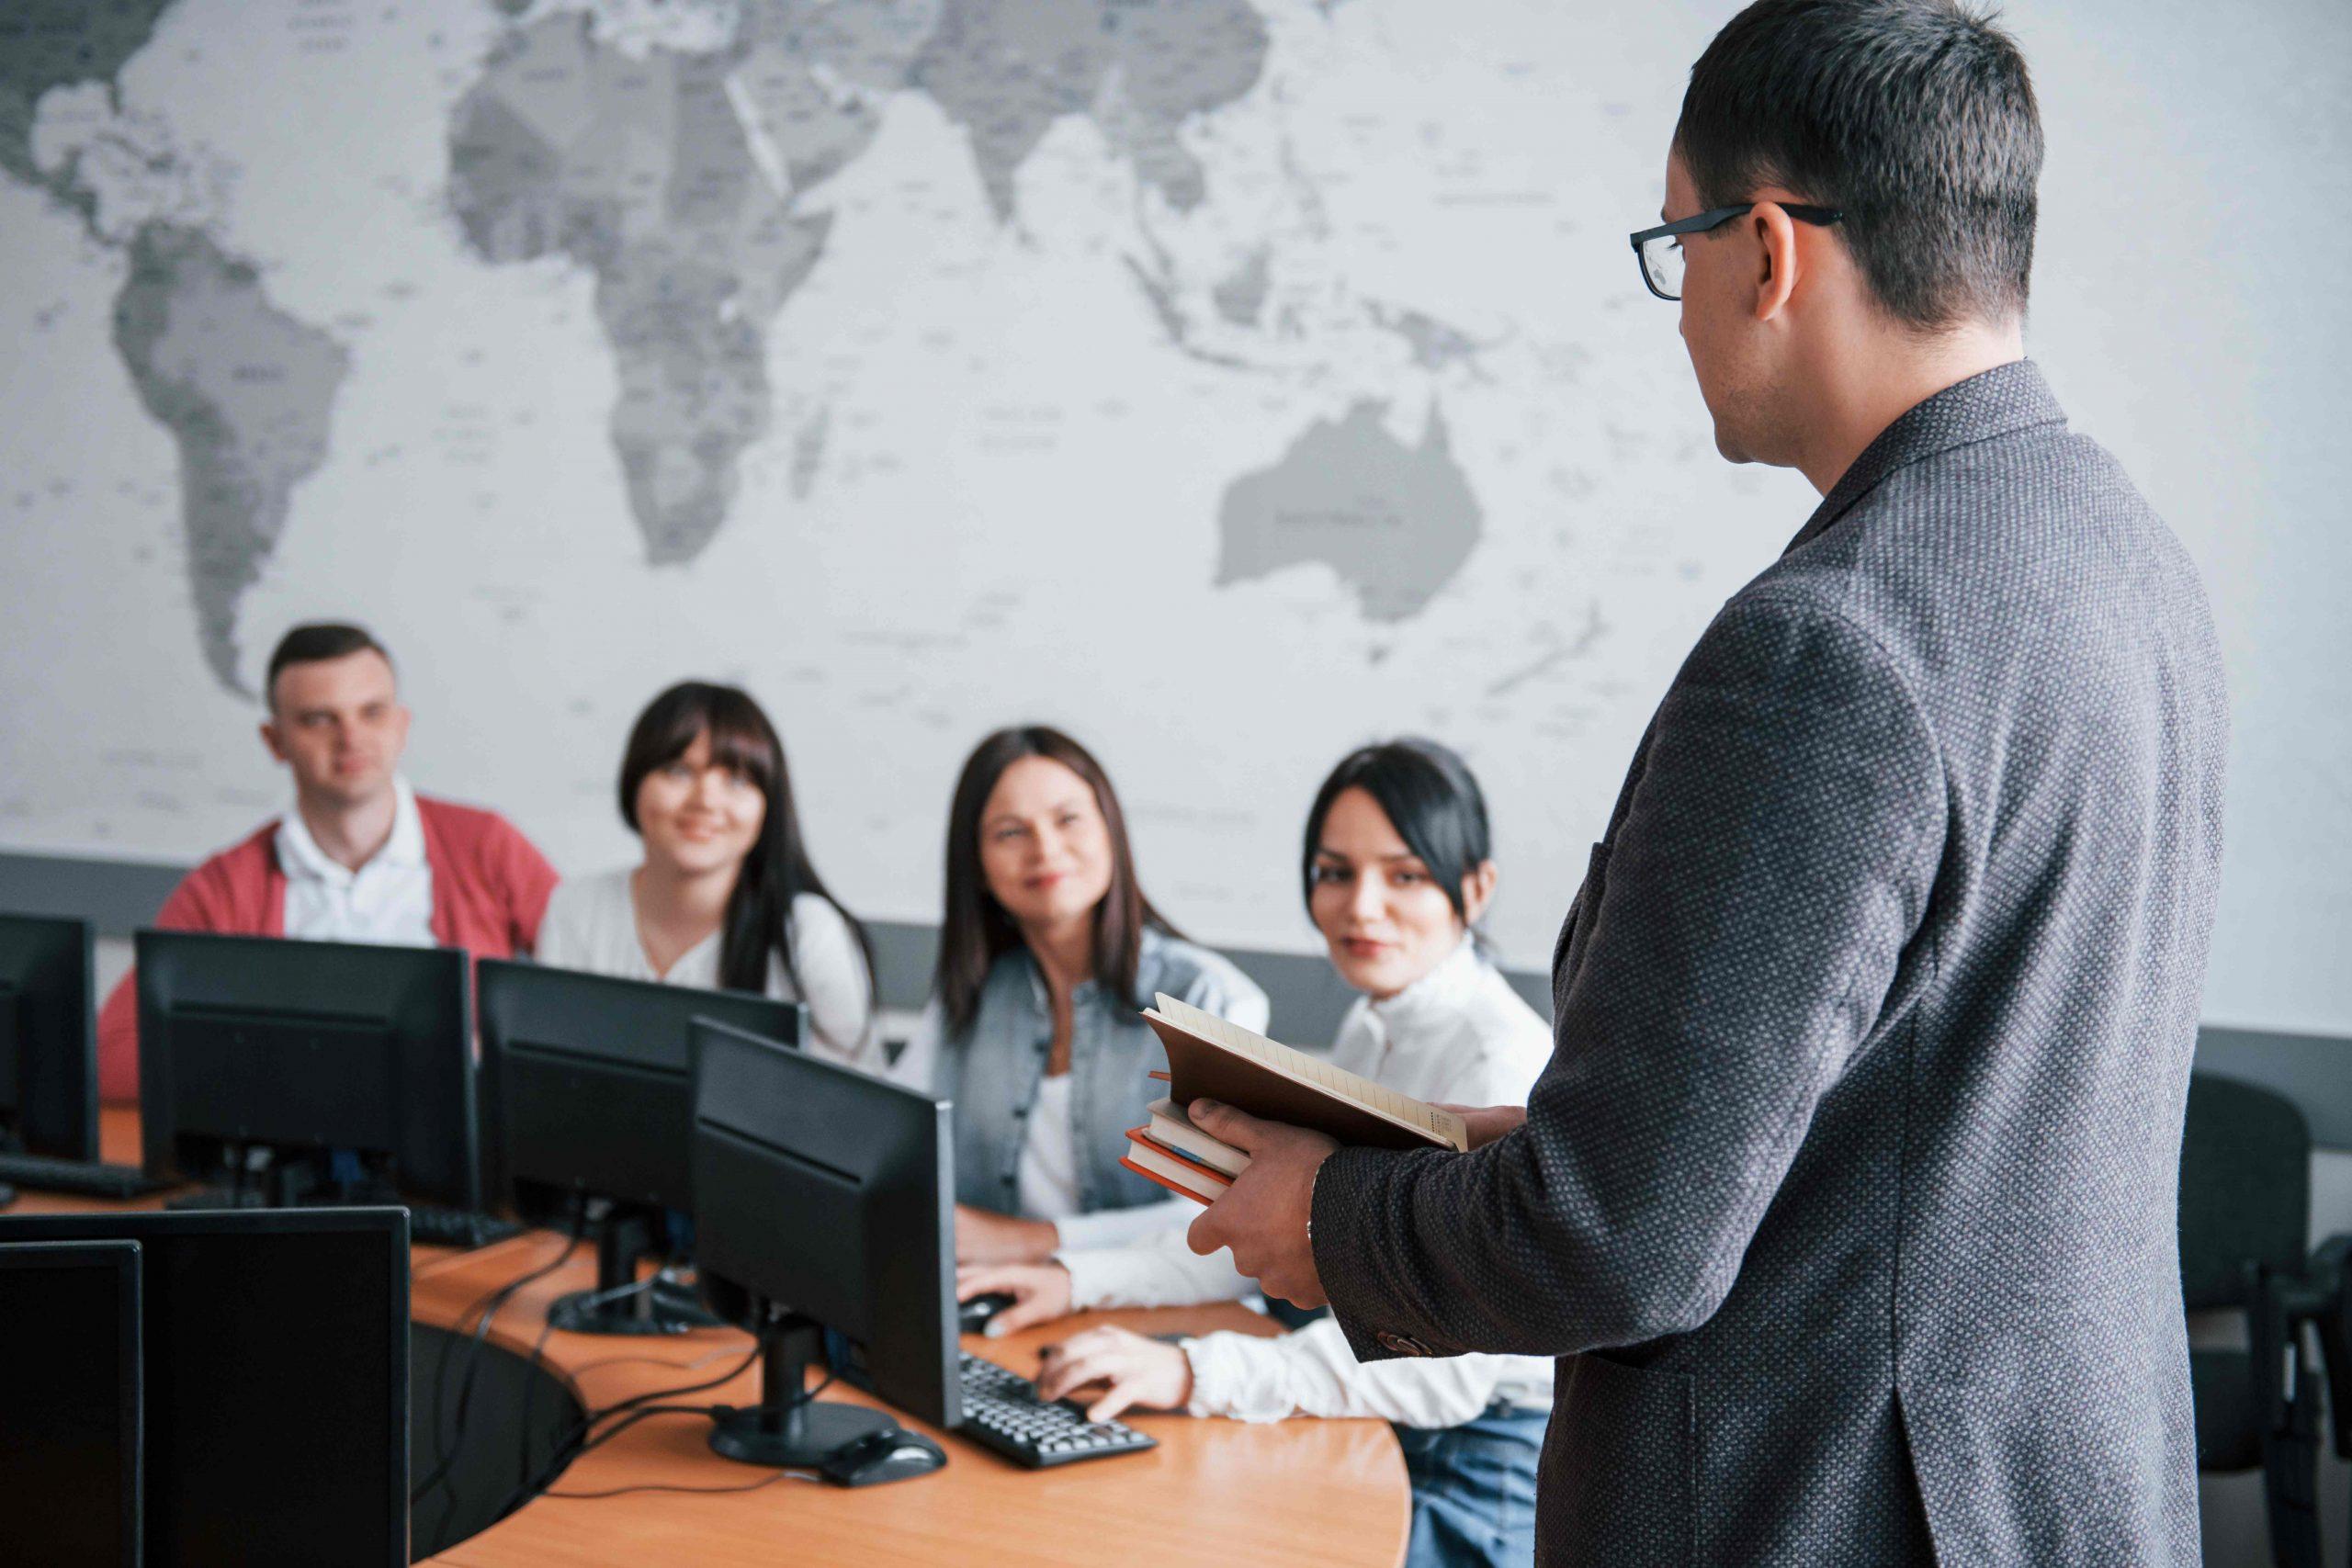 employés en réunion